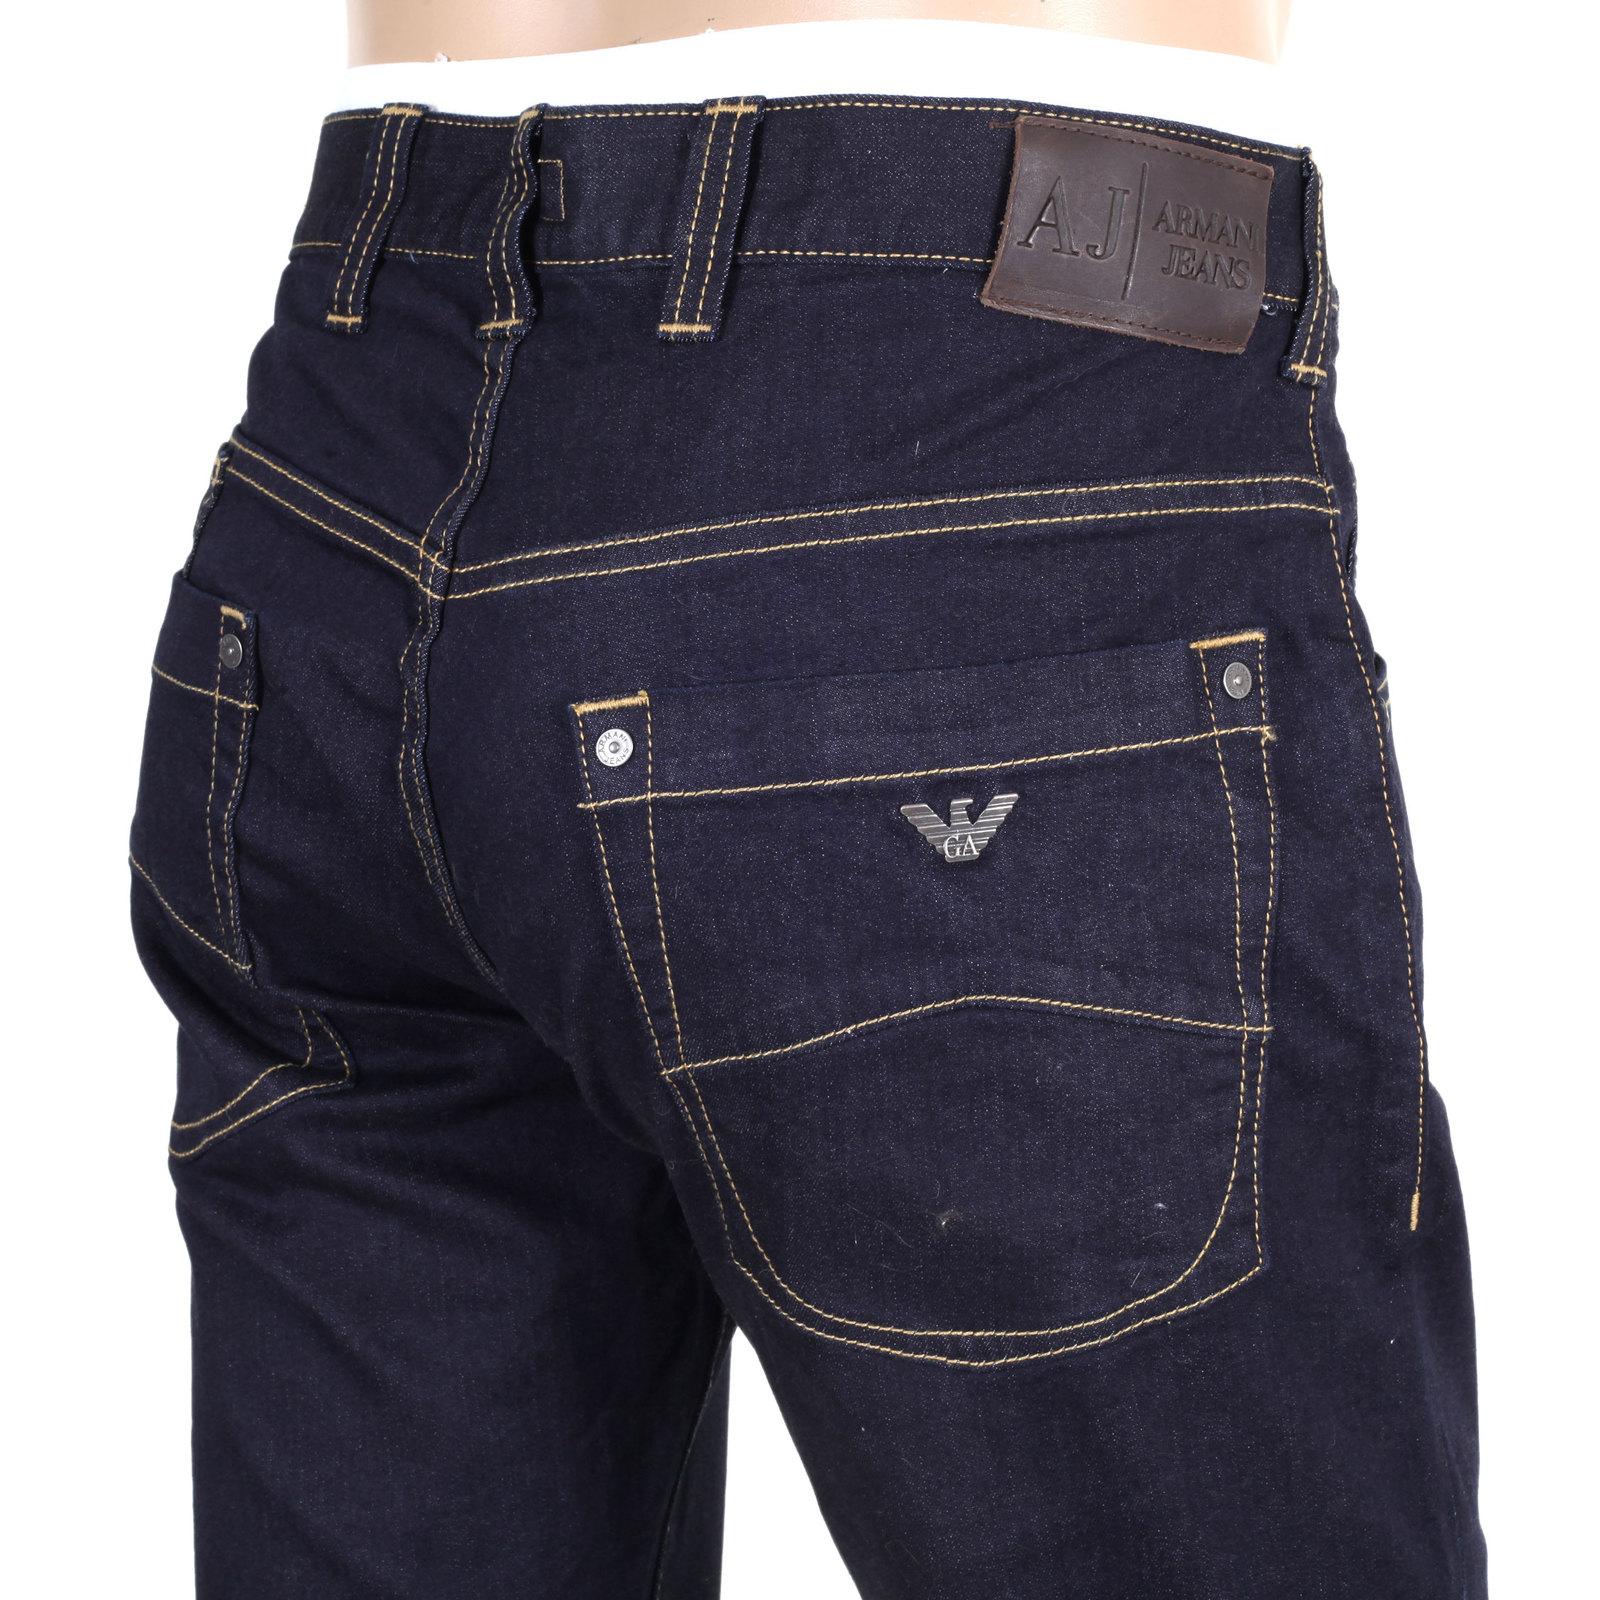 Dark Denim Low Rise Jeans for Men by Armani Jeans UK